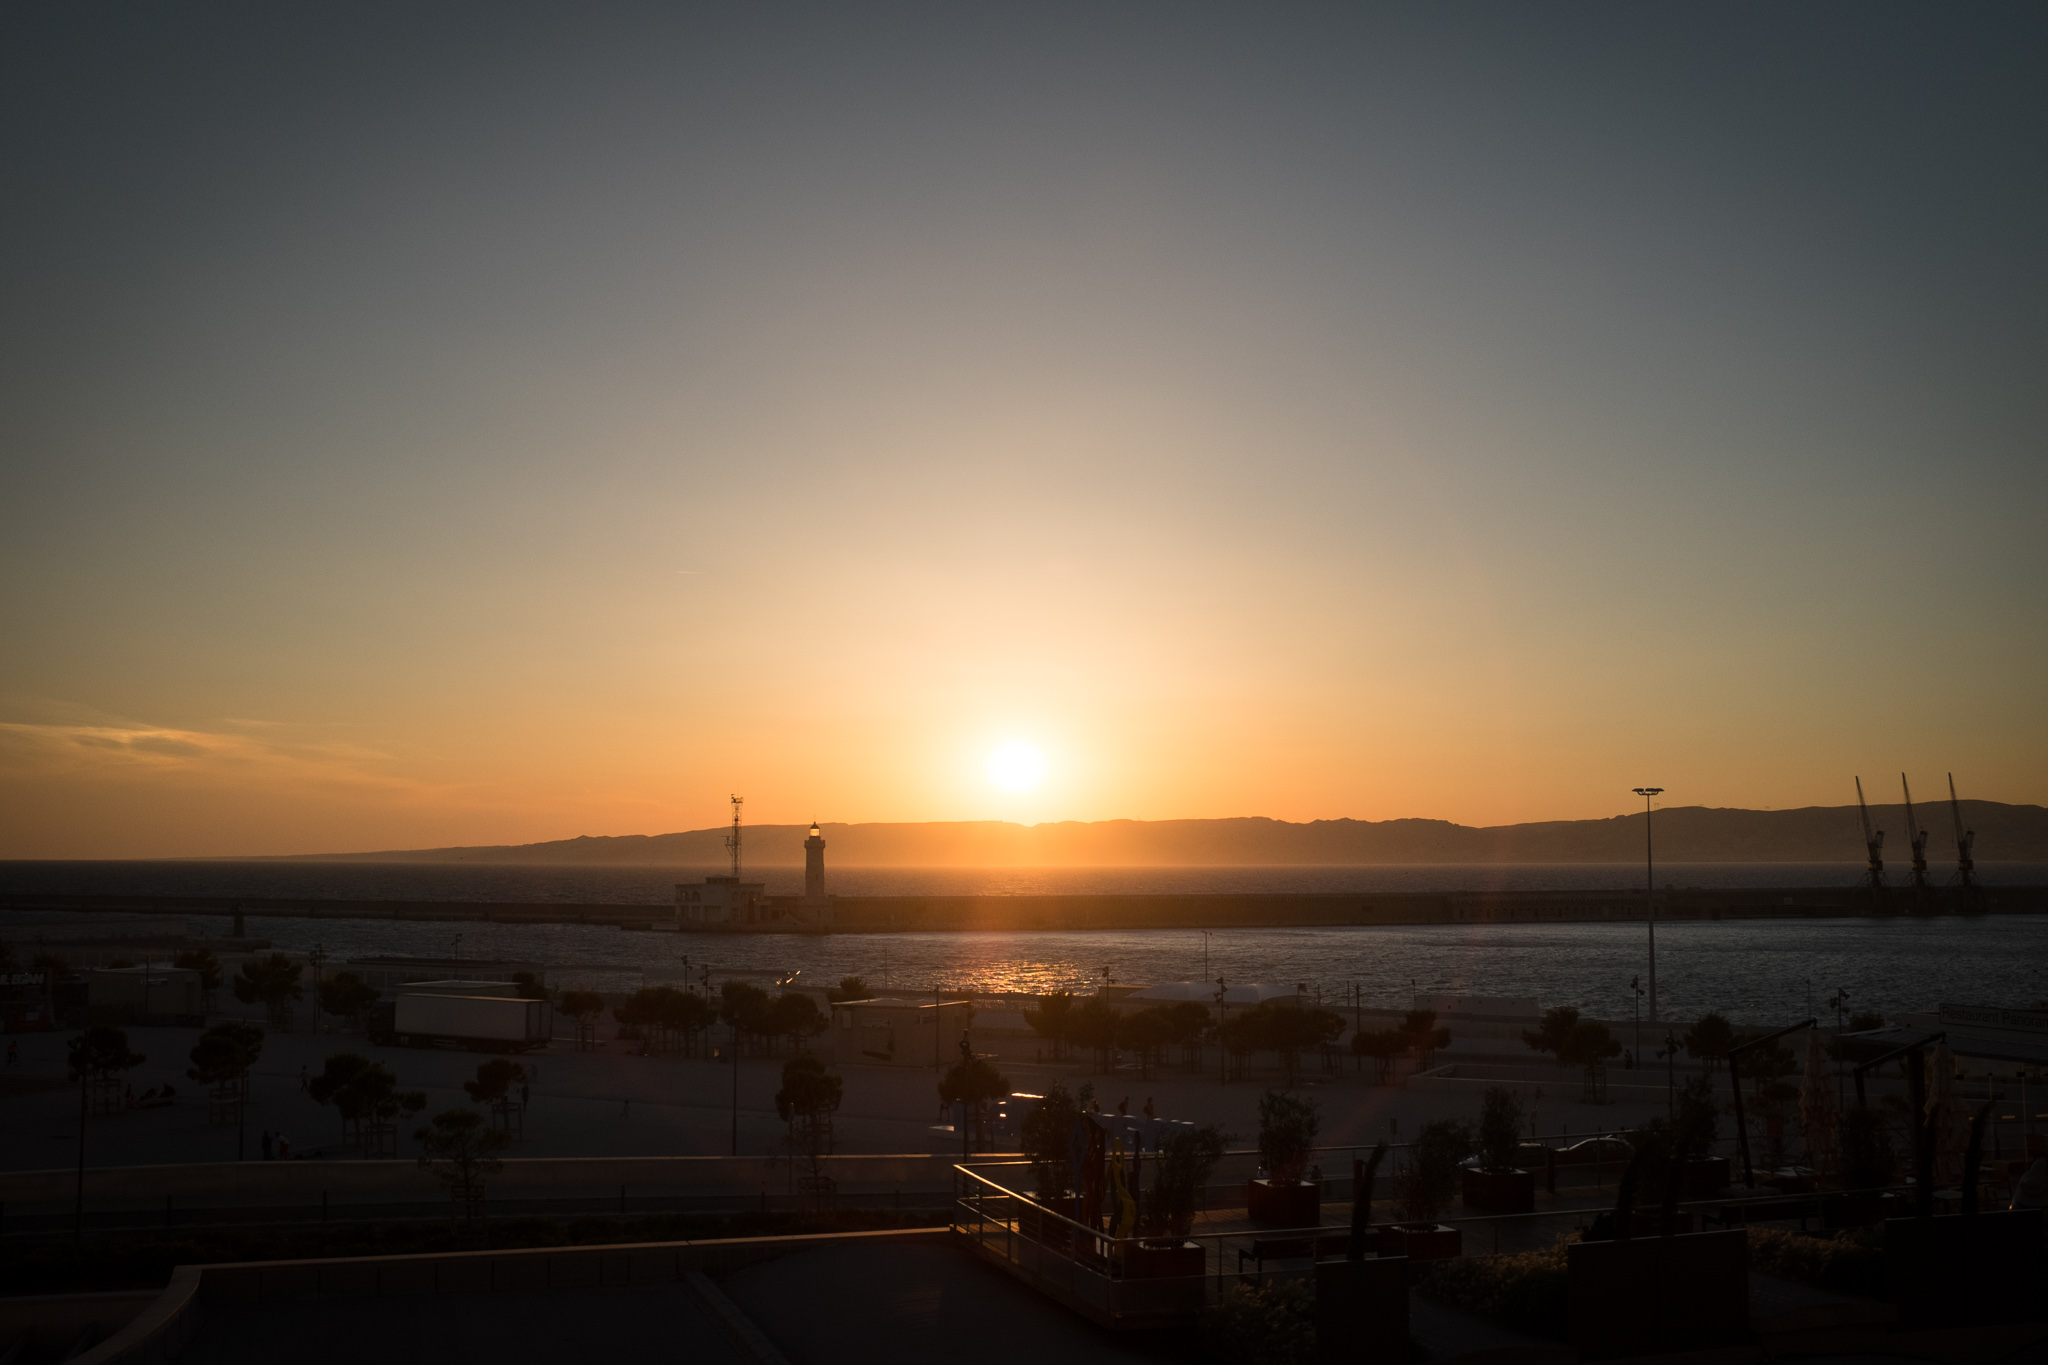 2777-urban-provence-marseille-sunset.jpg